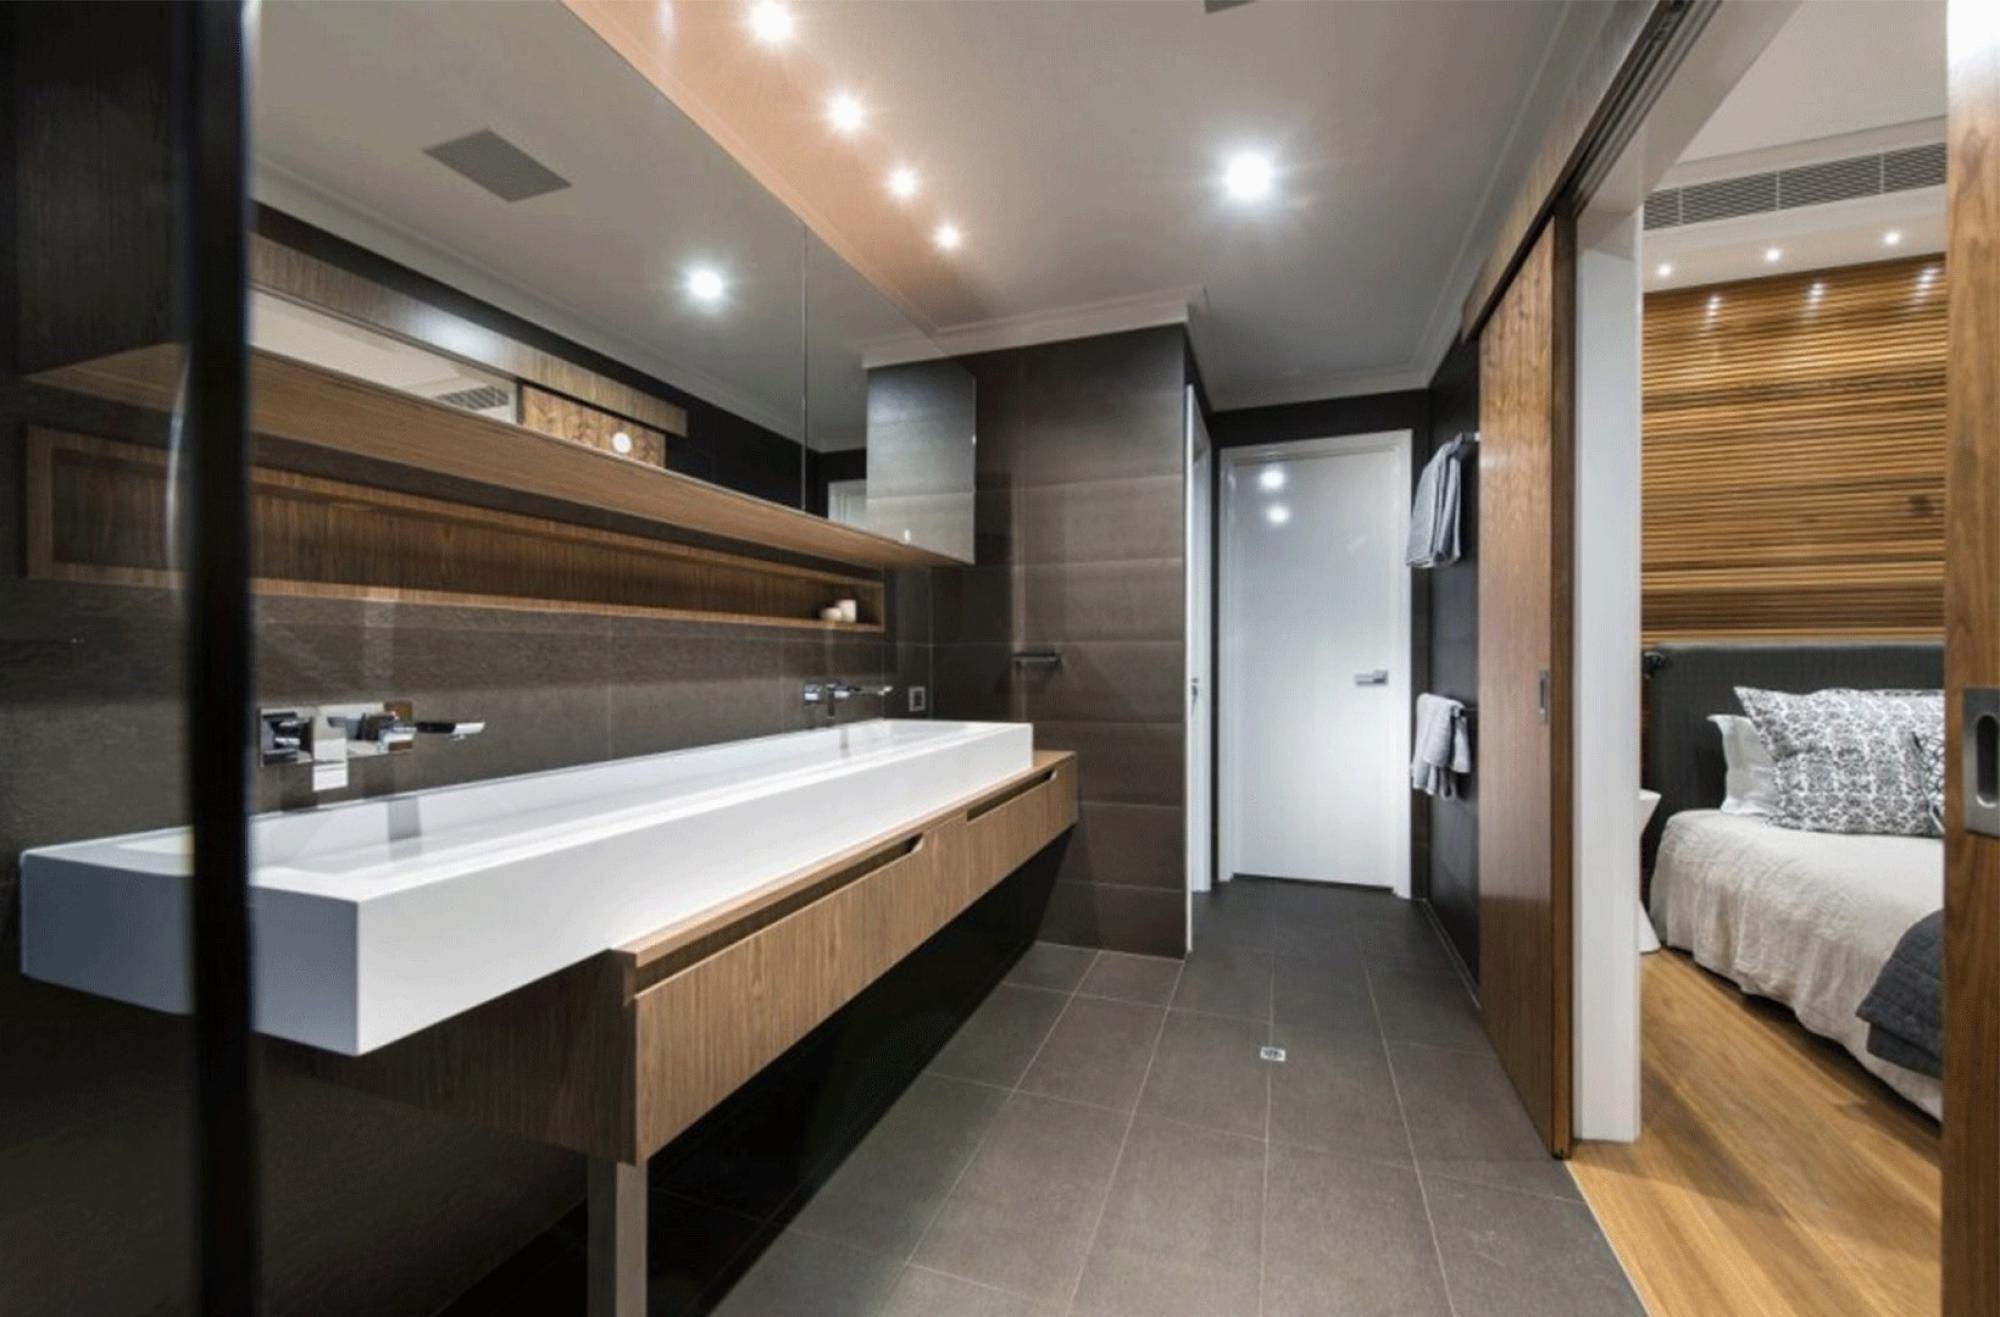 Adorable Modern Design In Bathroom Including Bright